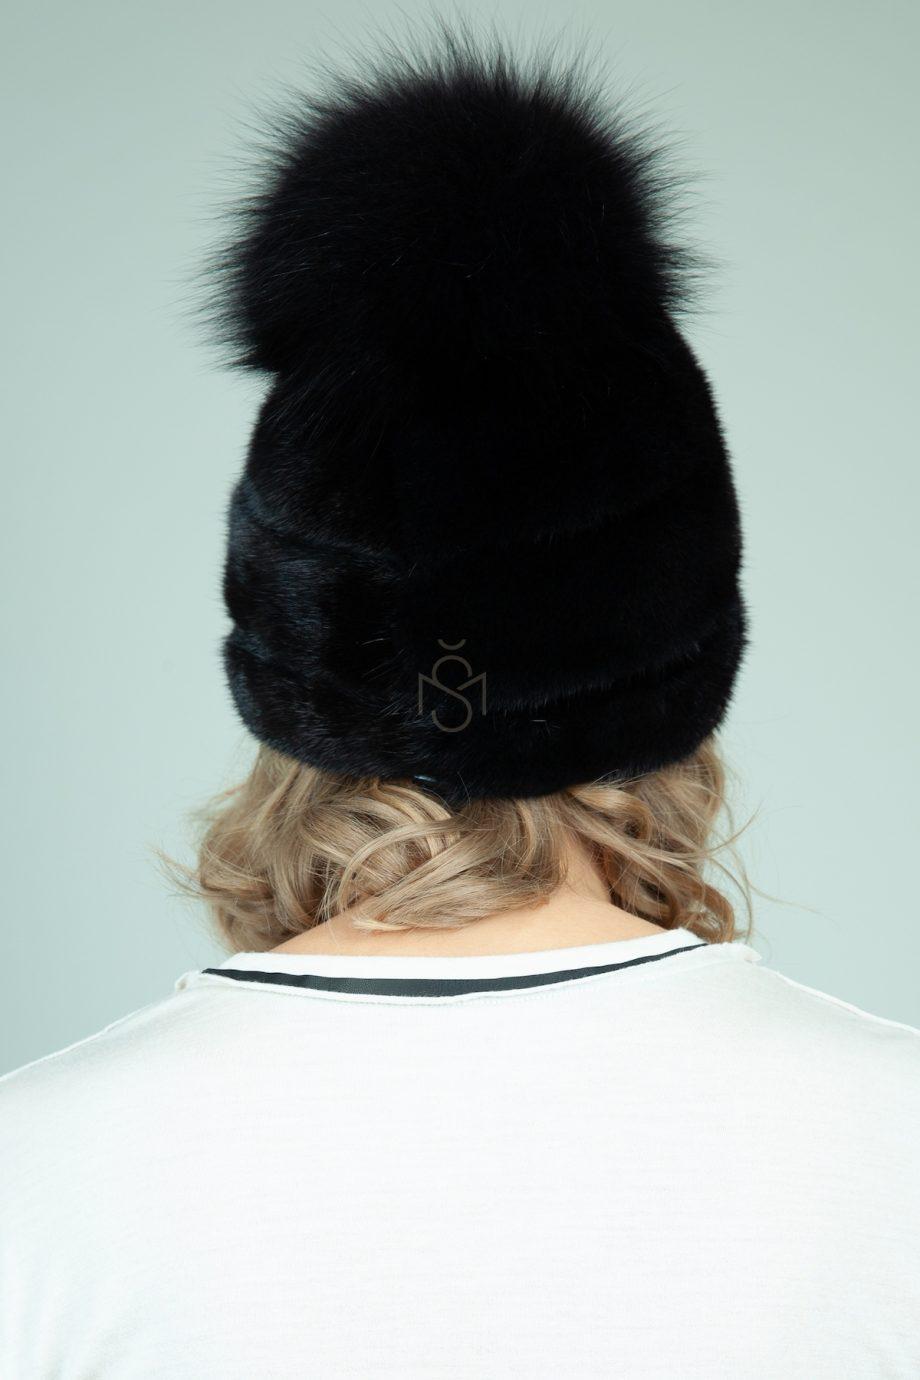 juodos audines kepure su odos intarpais ir pom-pom